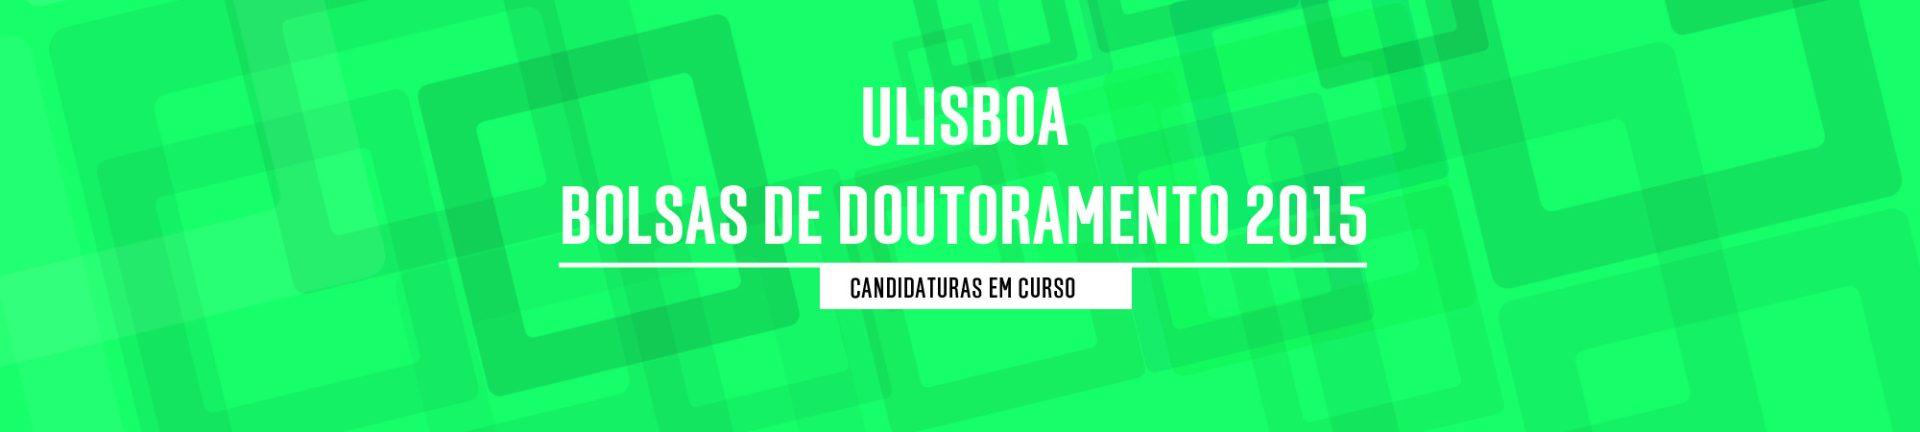 banner_bolsas_doutoramentos_A